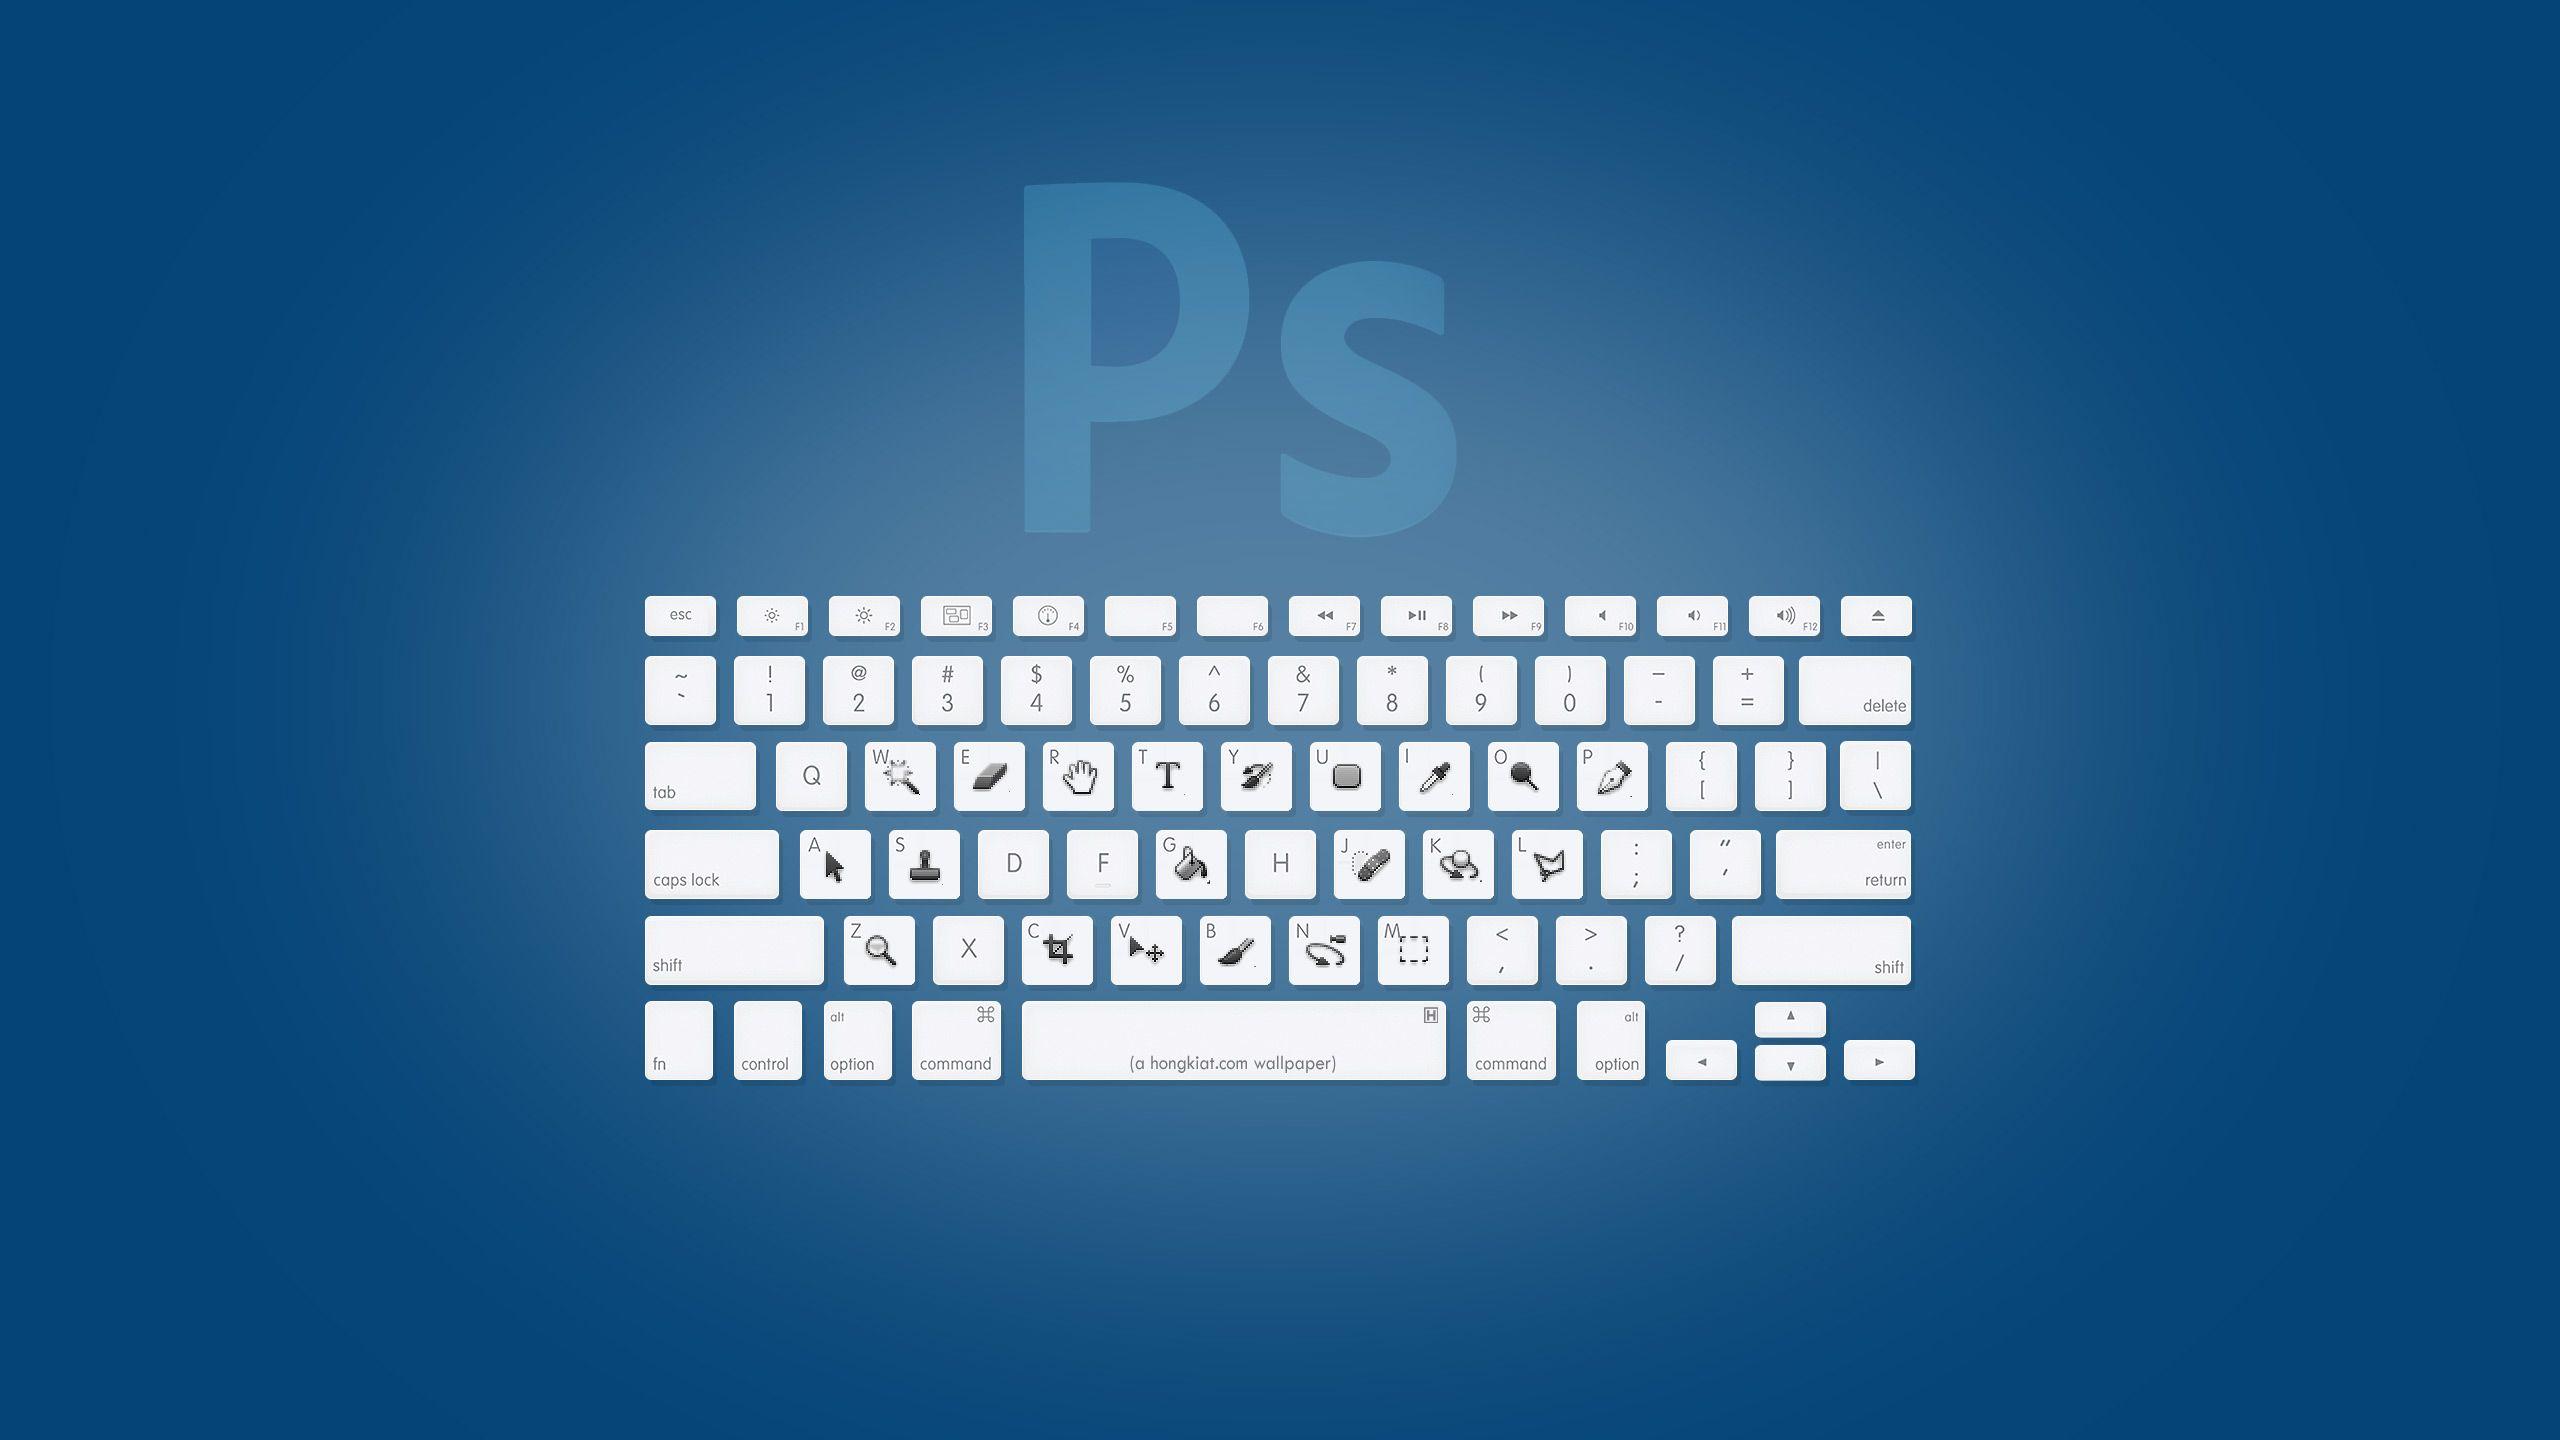 Adobe Photoshop Keyboard Shortcut Cheat Sheet